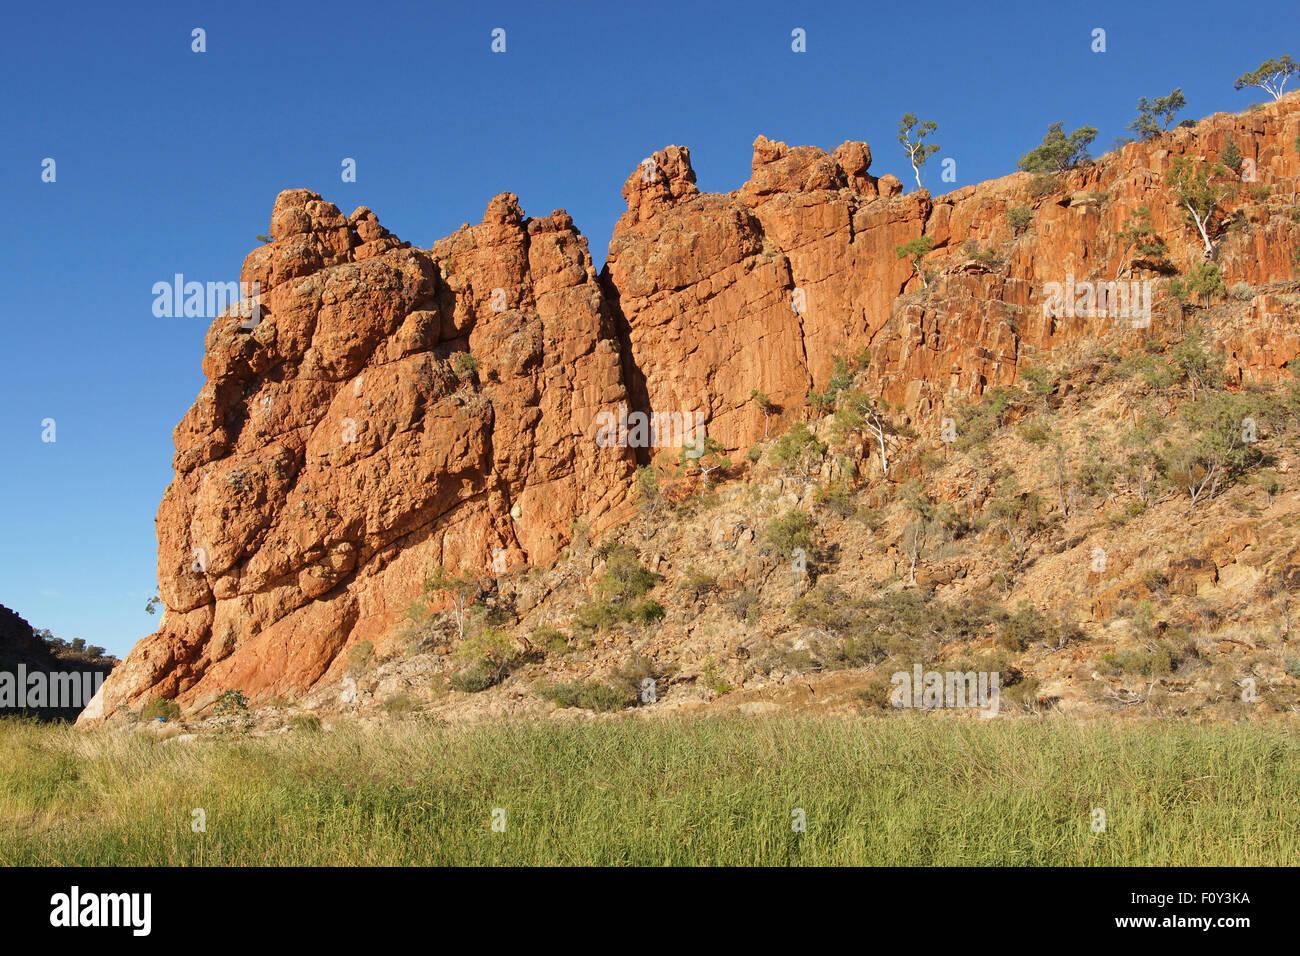 Glen Helen Gorge, West MacDonnell National Park, Northern Territory, Australia - Stock Image